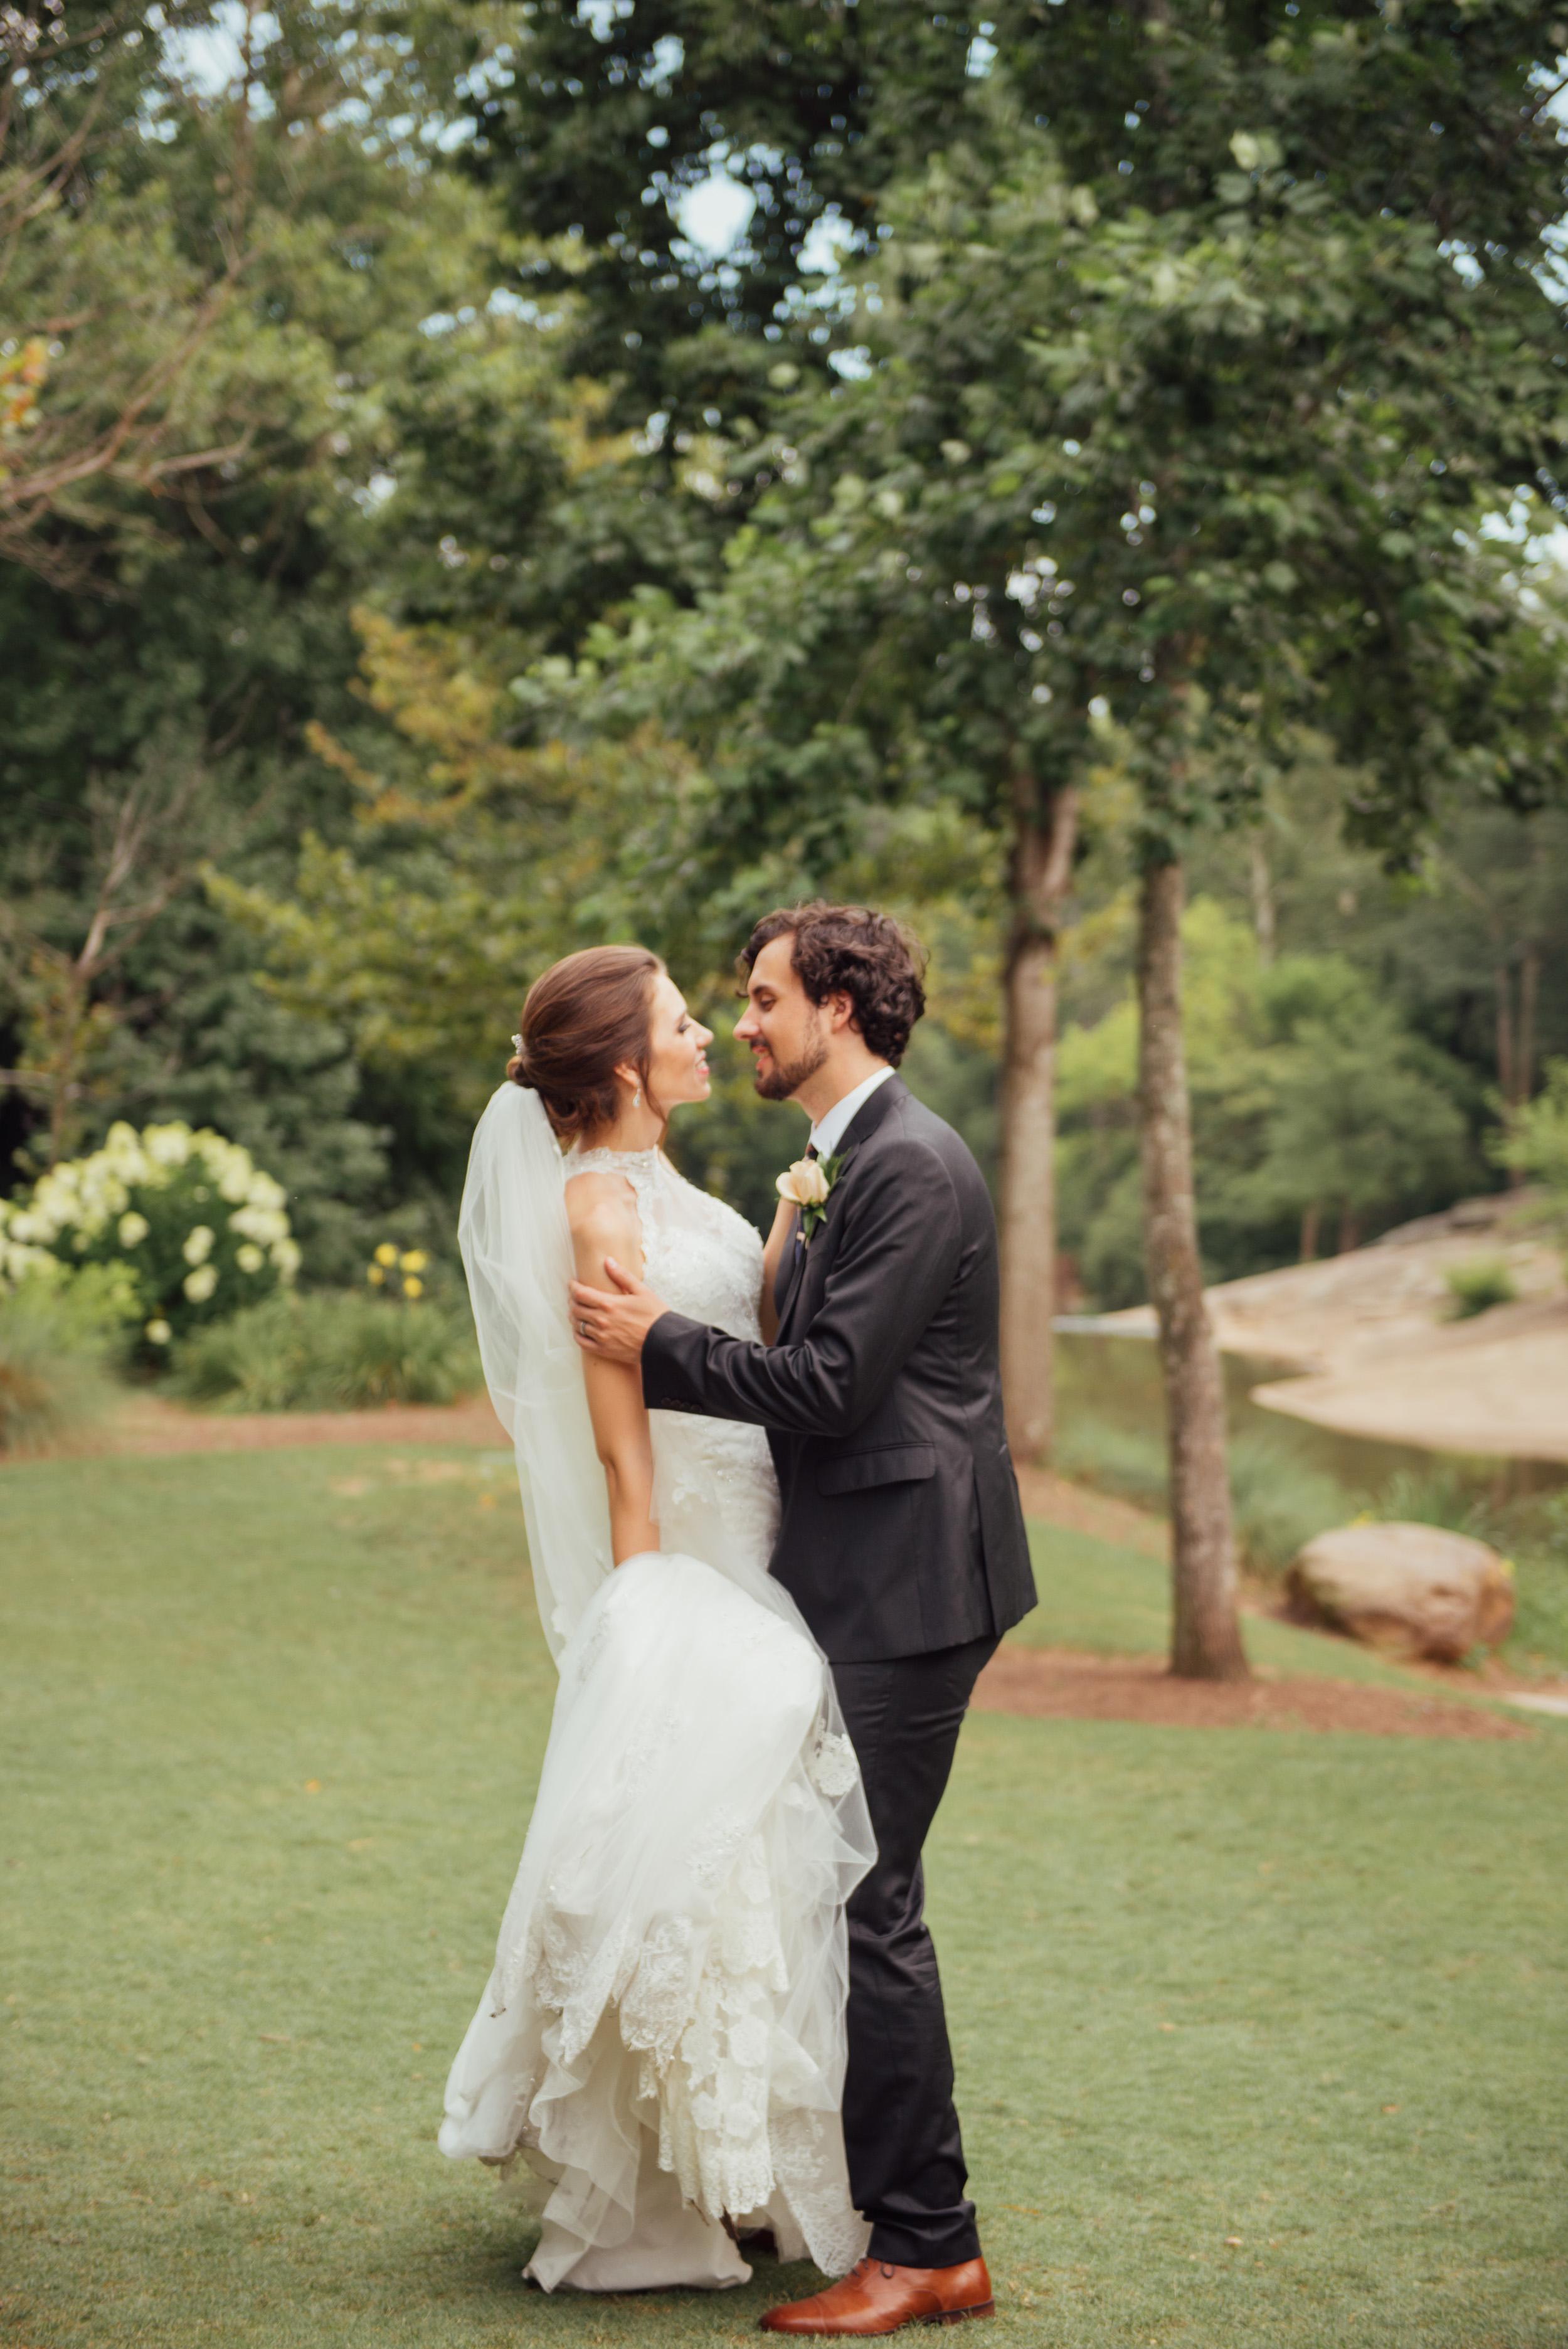 cleland-studios-wedding-photography-47.jpg